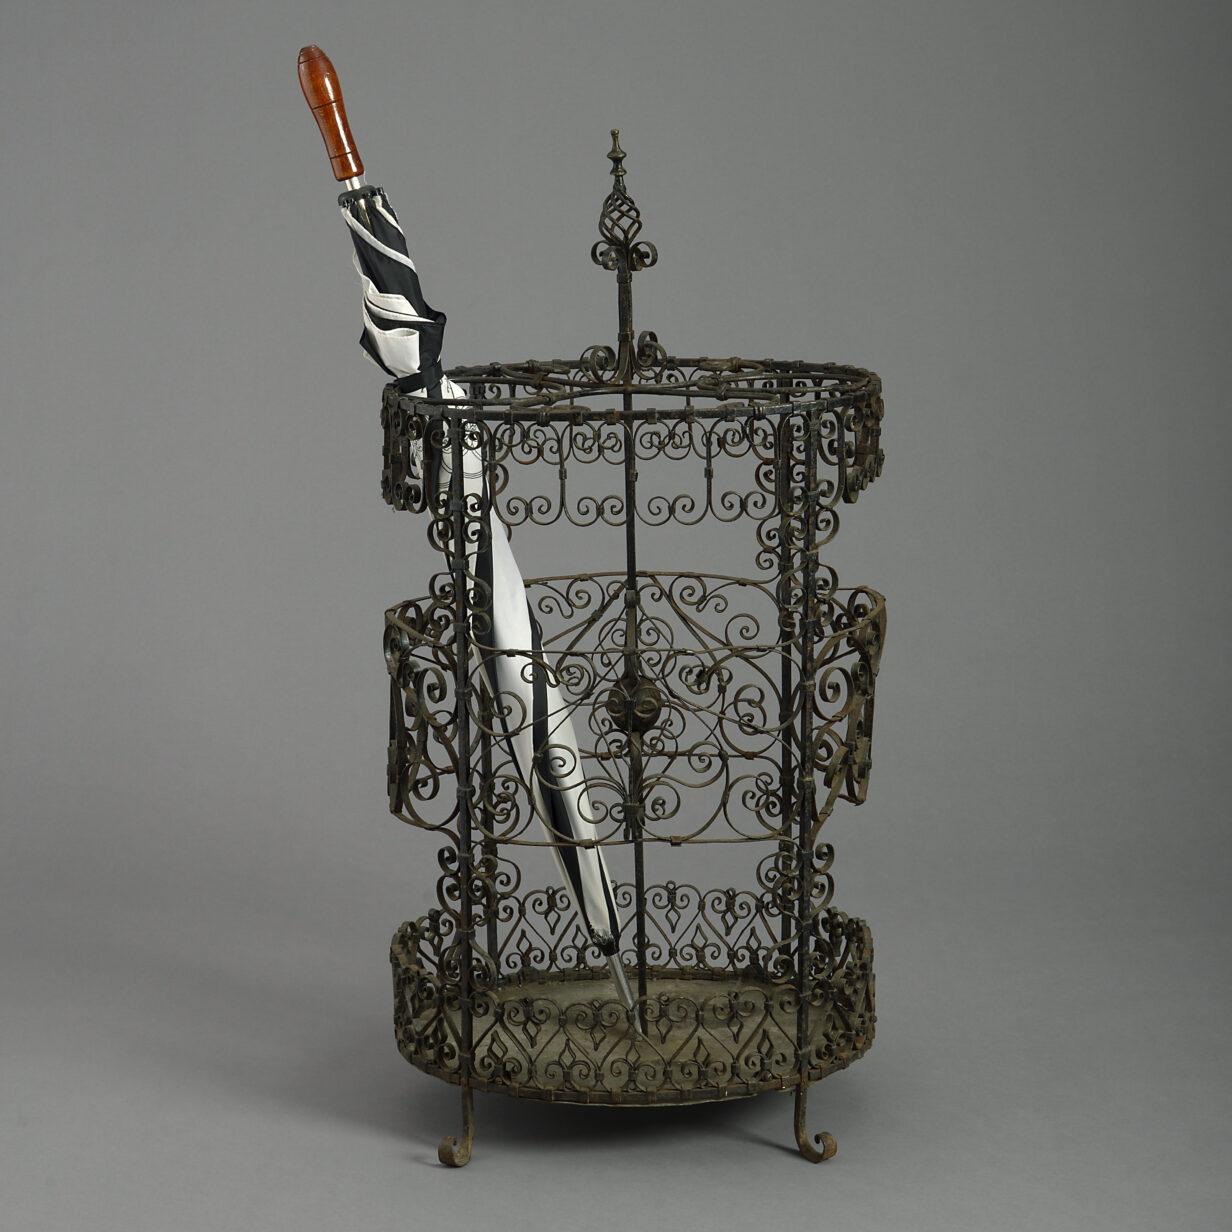 Wrought Iron Stick Stand